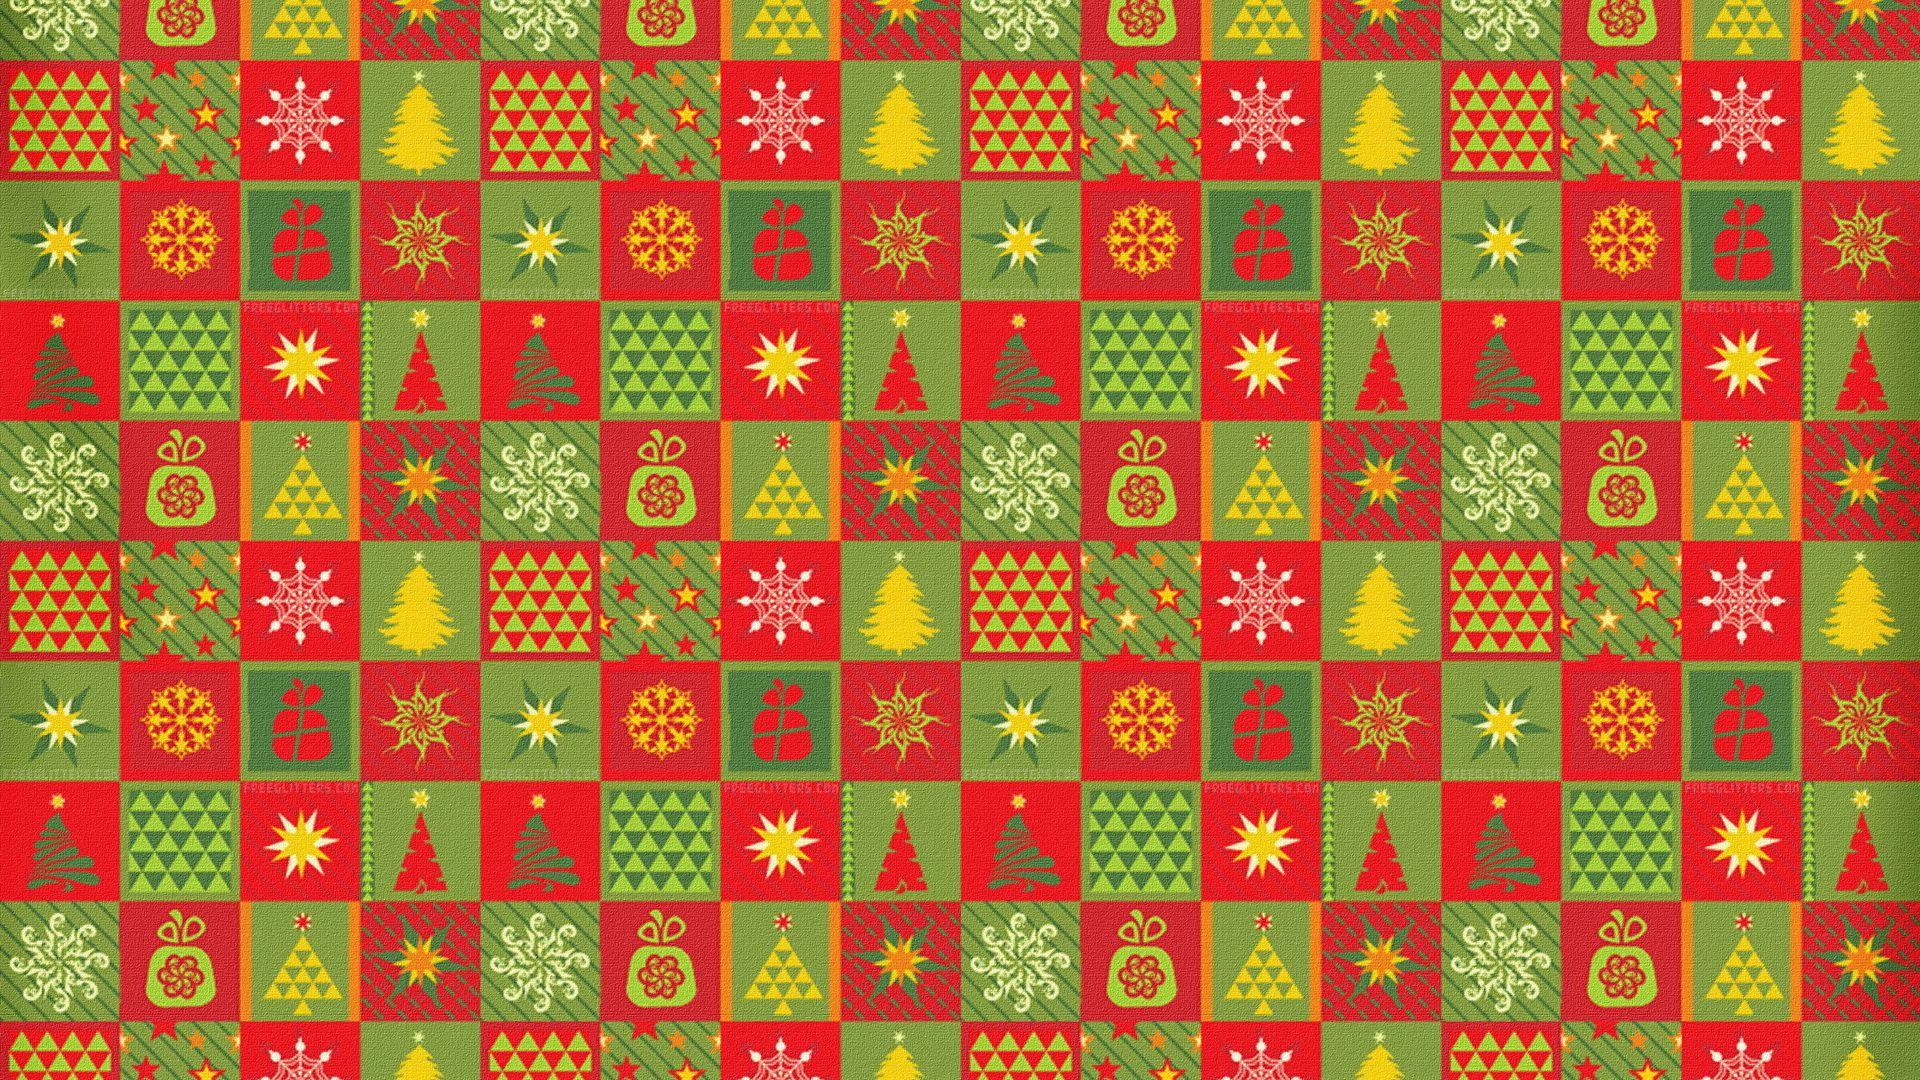 Christmas Scrapbooking wallpaper photo hd